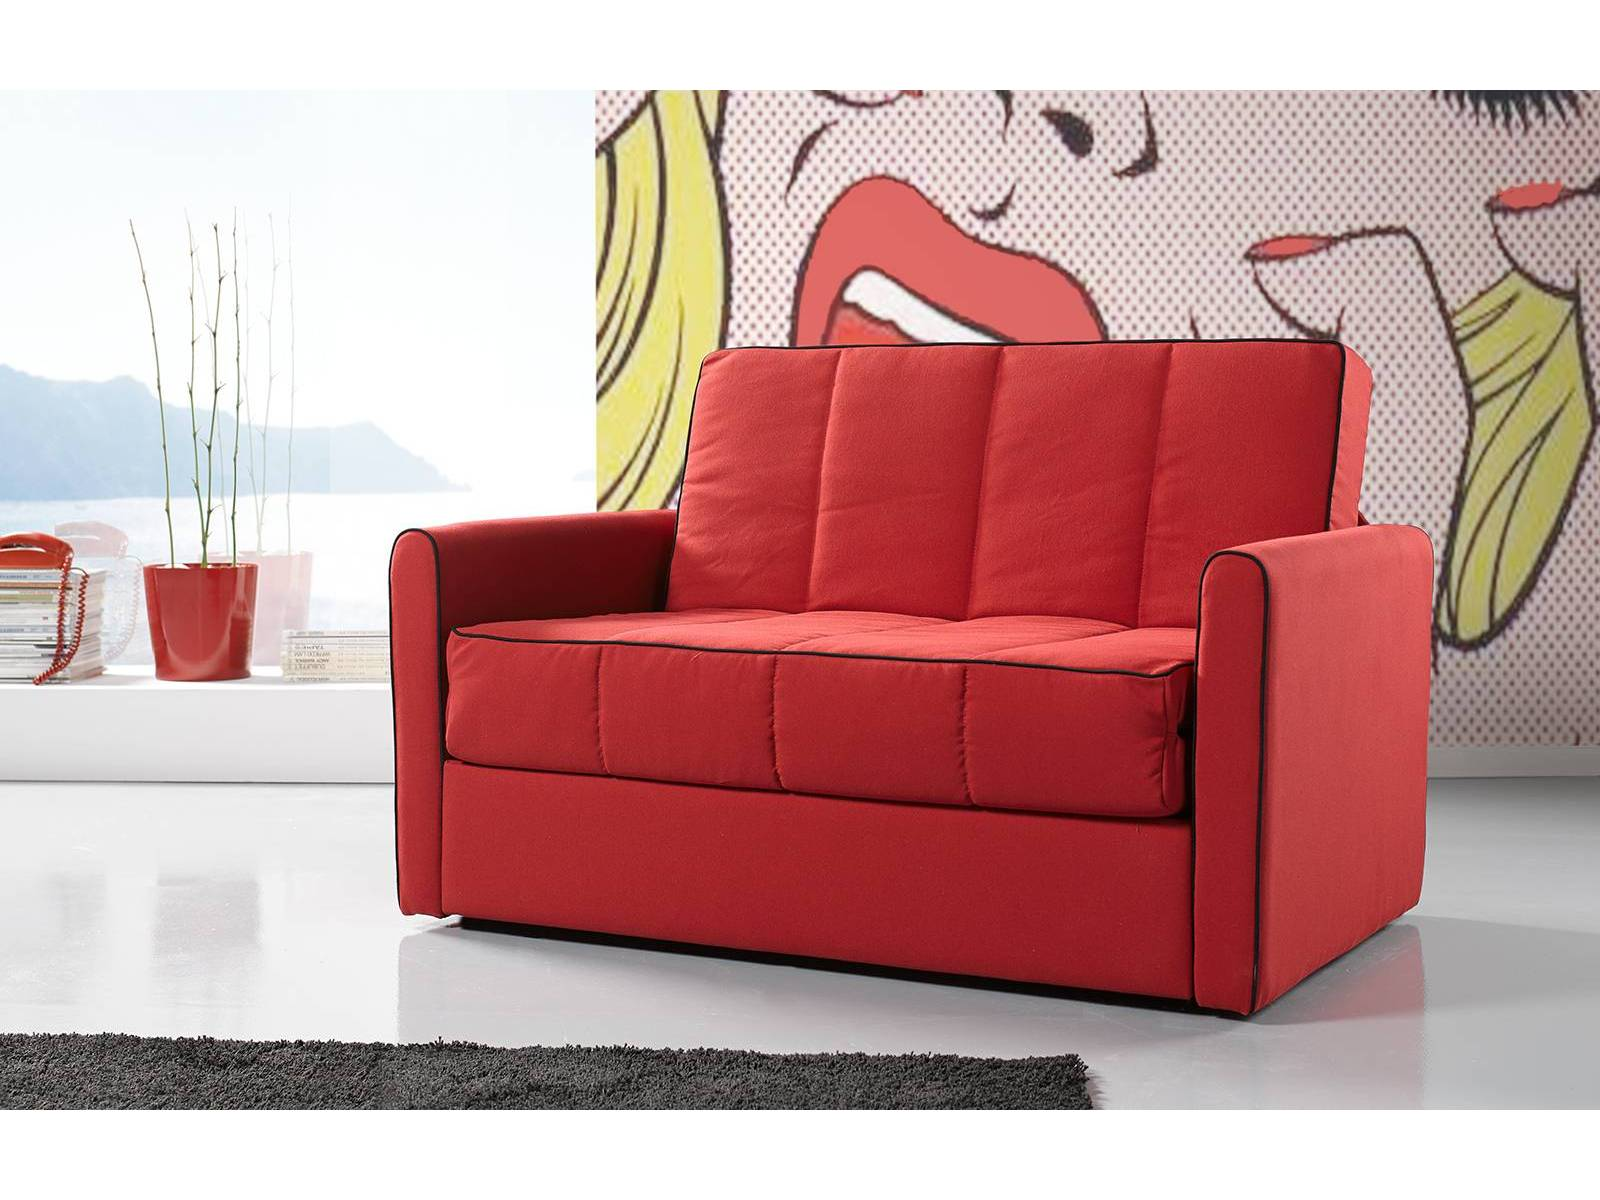 Trucos para el hogar tips para elegir un sof cama perfecto - Sofa cama merkamueble ...